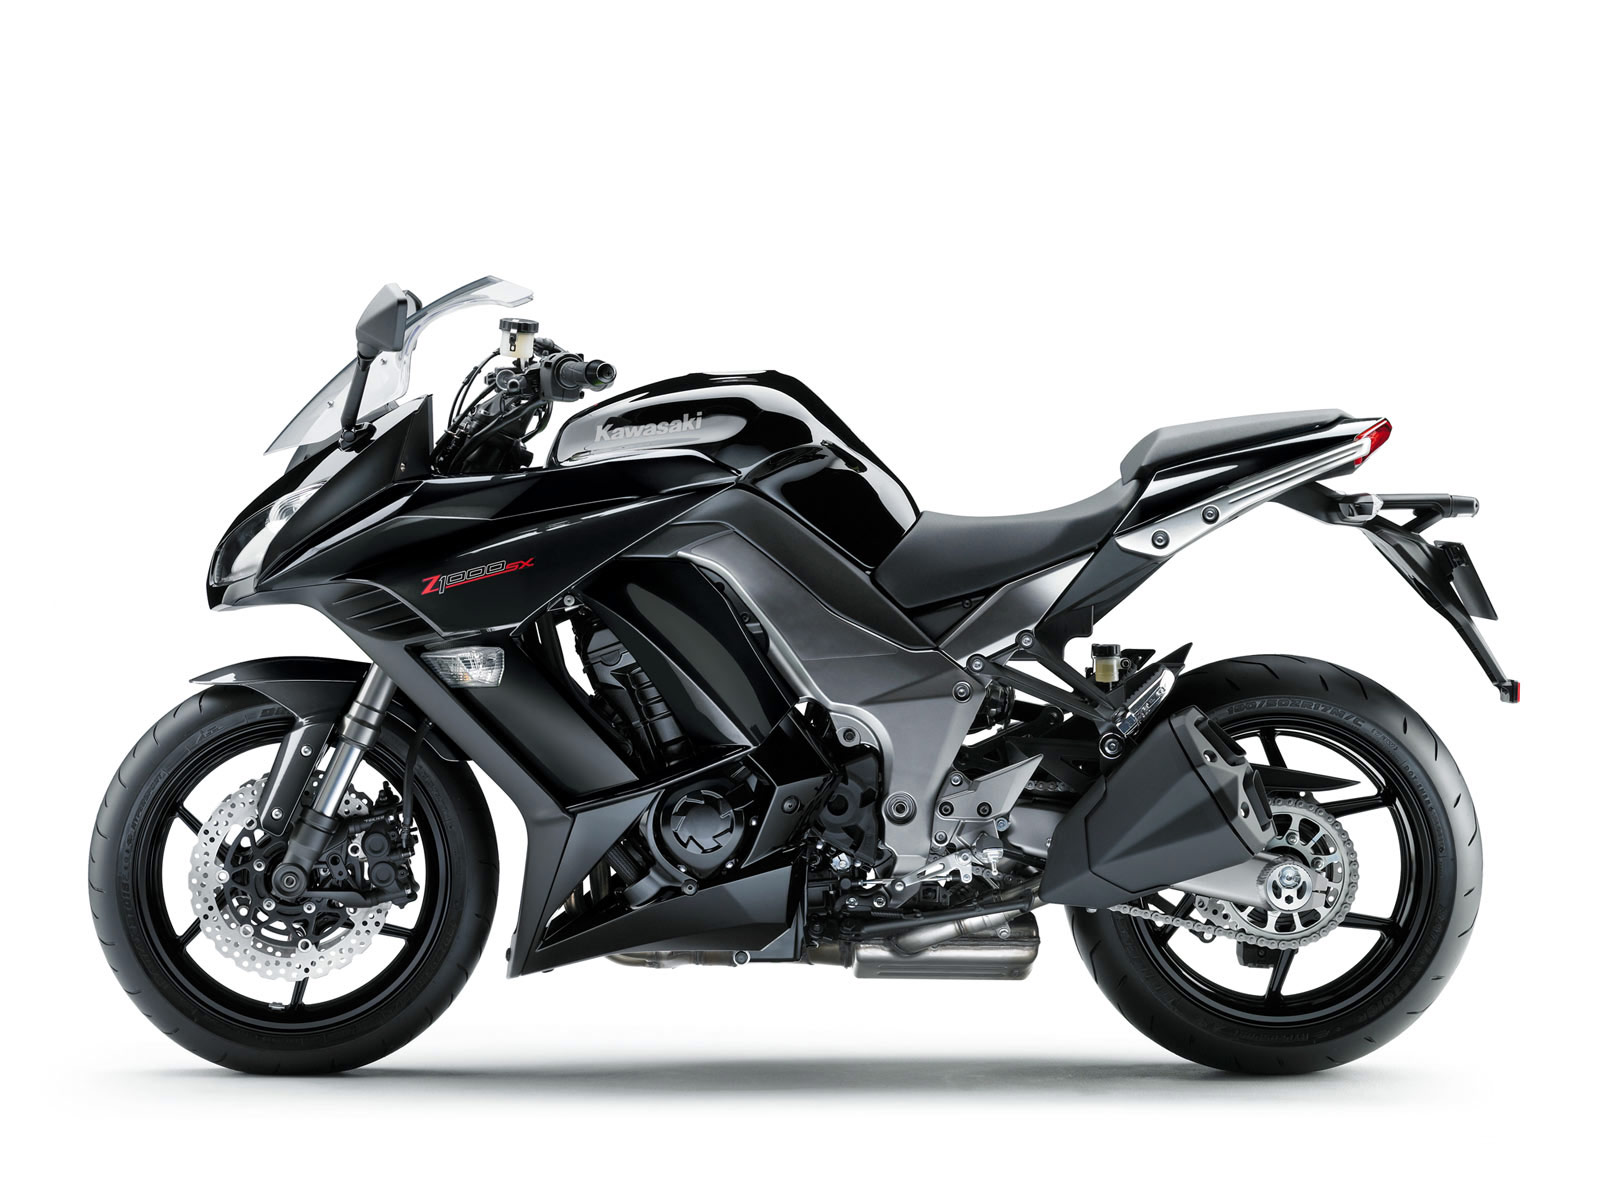 2011 kawasaki z 1000 sx motorcycle wallpaper. Black Bedroom Furniture Sets. Home Design Ideas